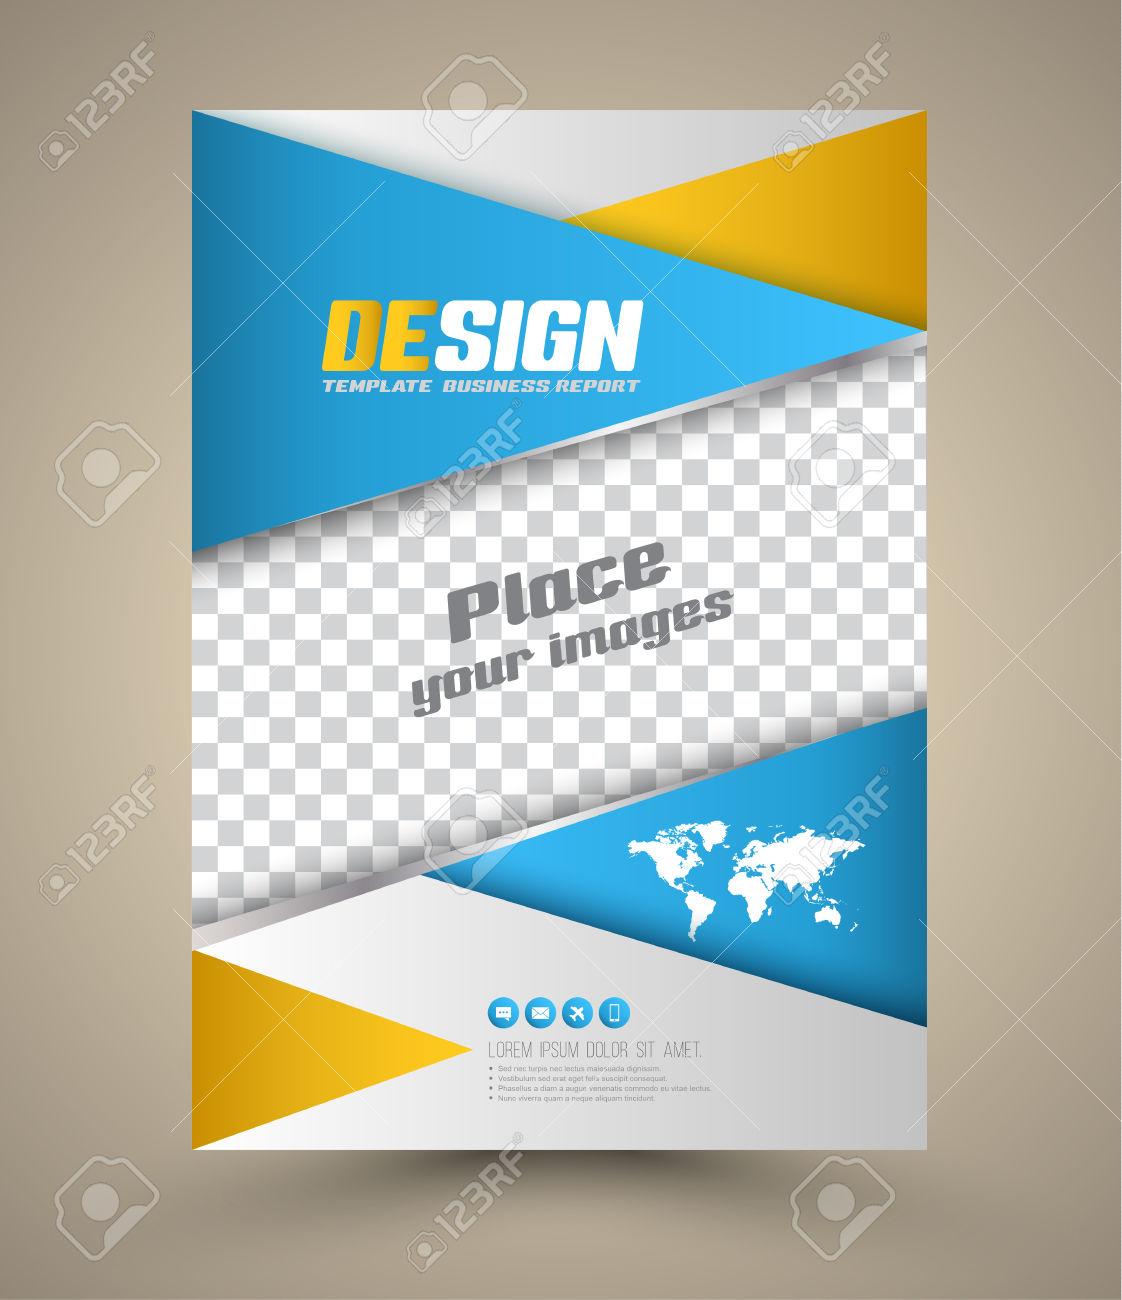 Free design book clipground for Design book